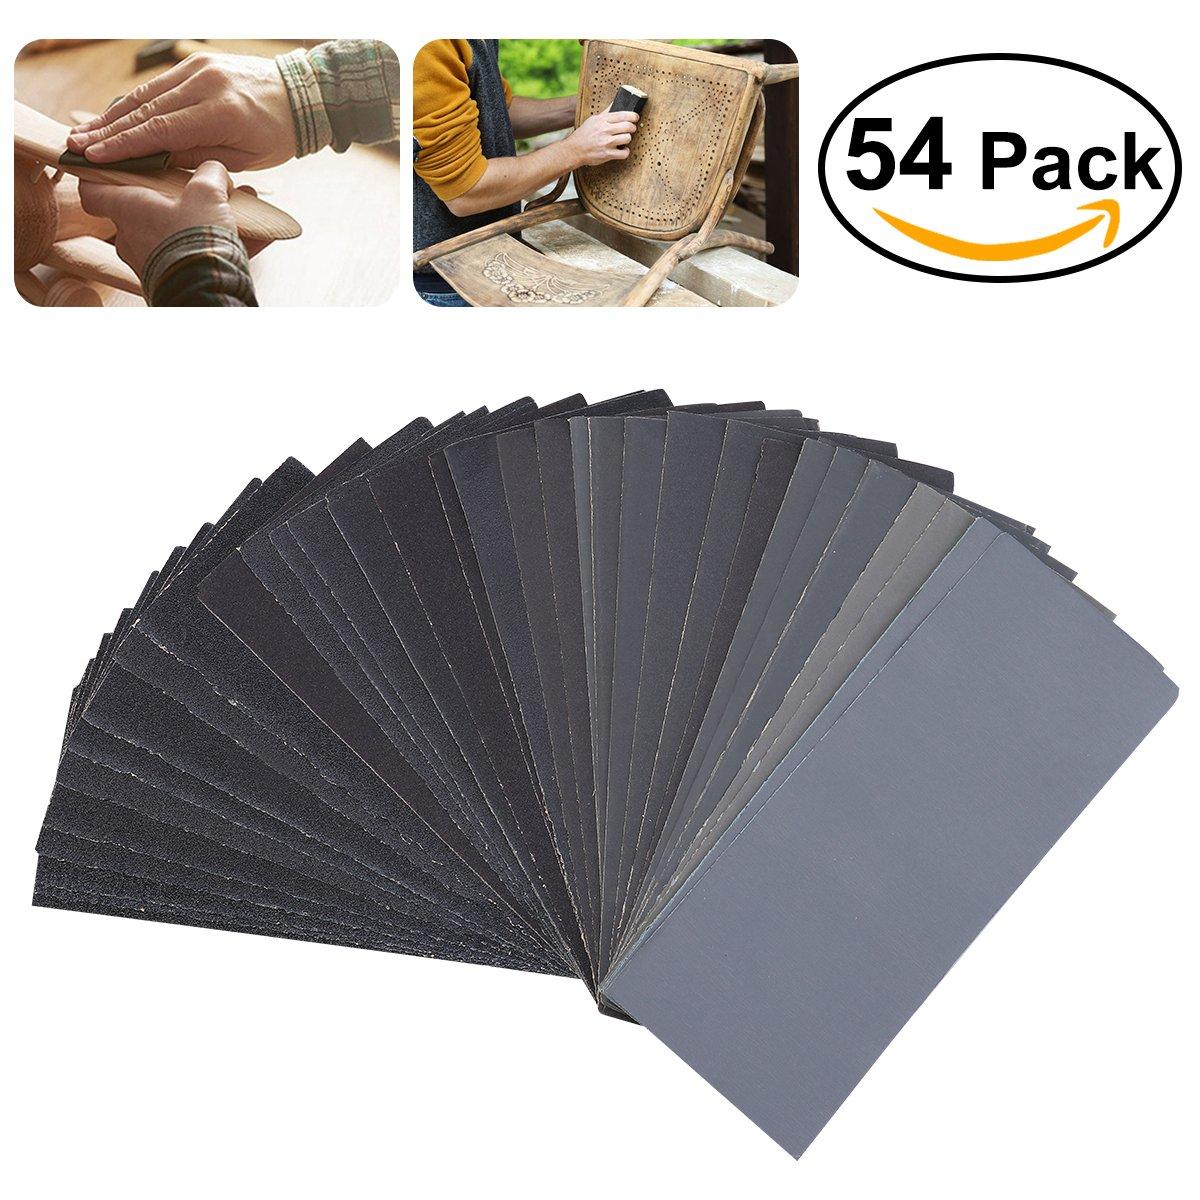 UEETEK 54pcs 60 bis 3000 Korn Sandpapier Sortiment Nass Trockenes Sand Papier fü r Automotive Schleifen Holz